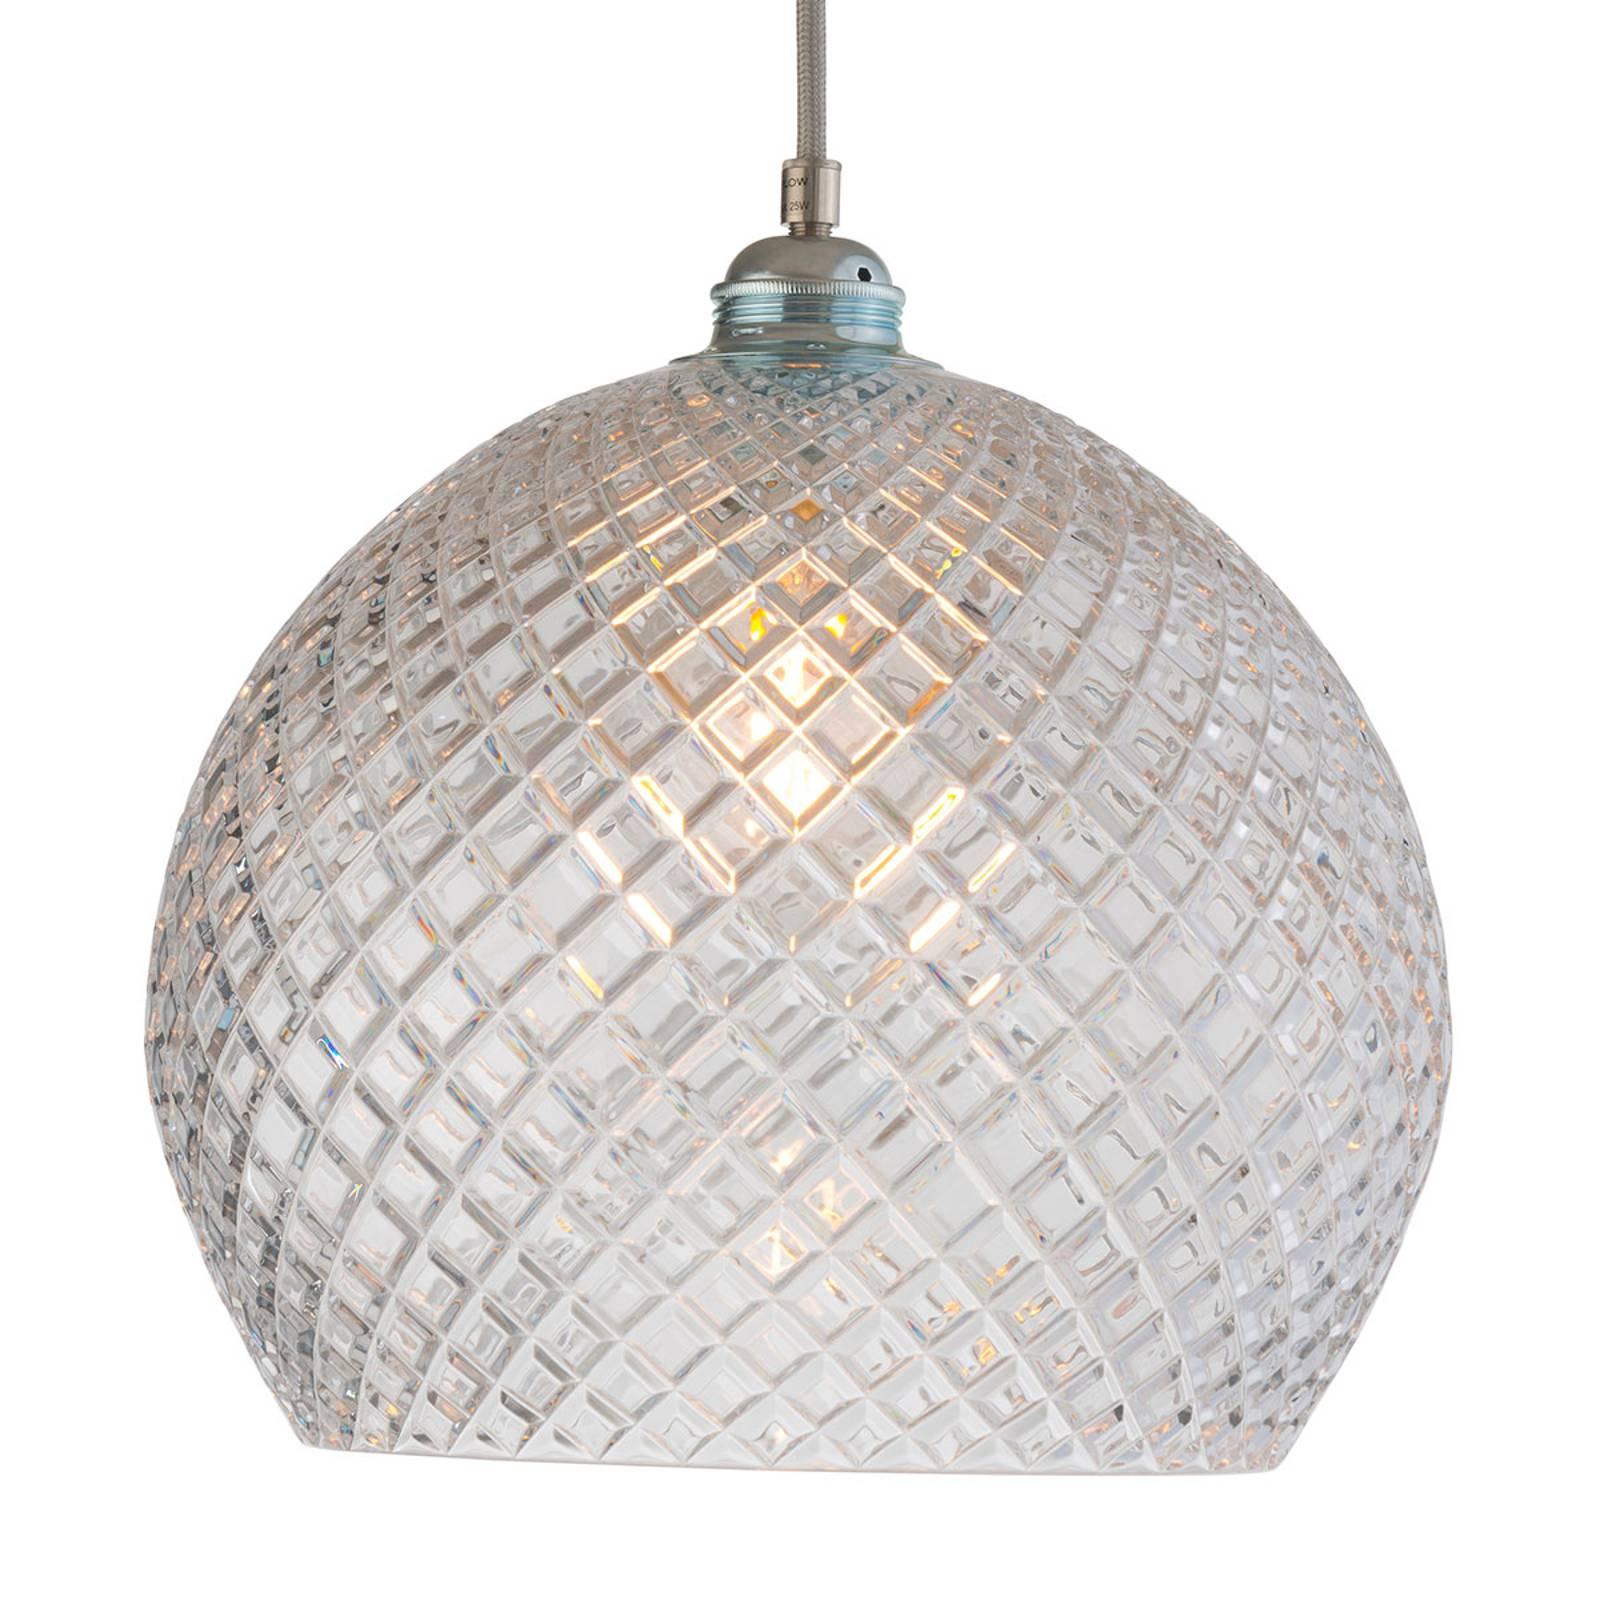 EBB & FLOW Rowan hanglamp, zilver Ø 28cm